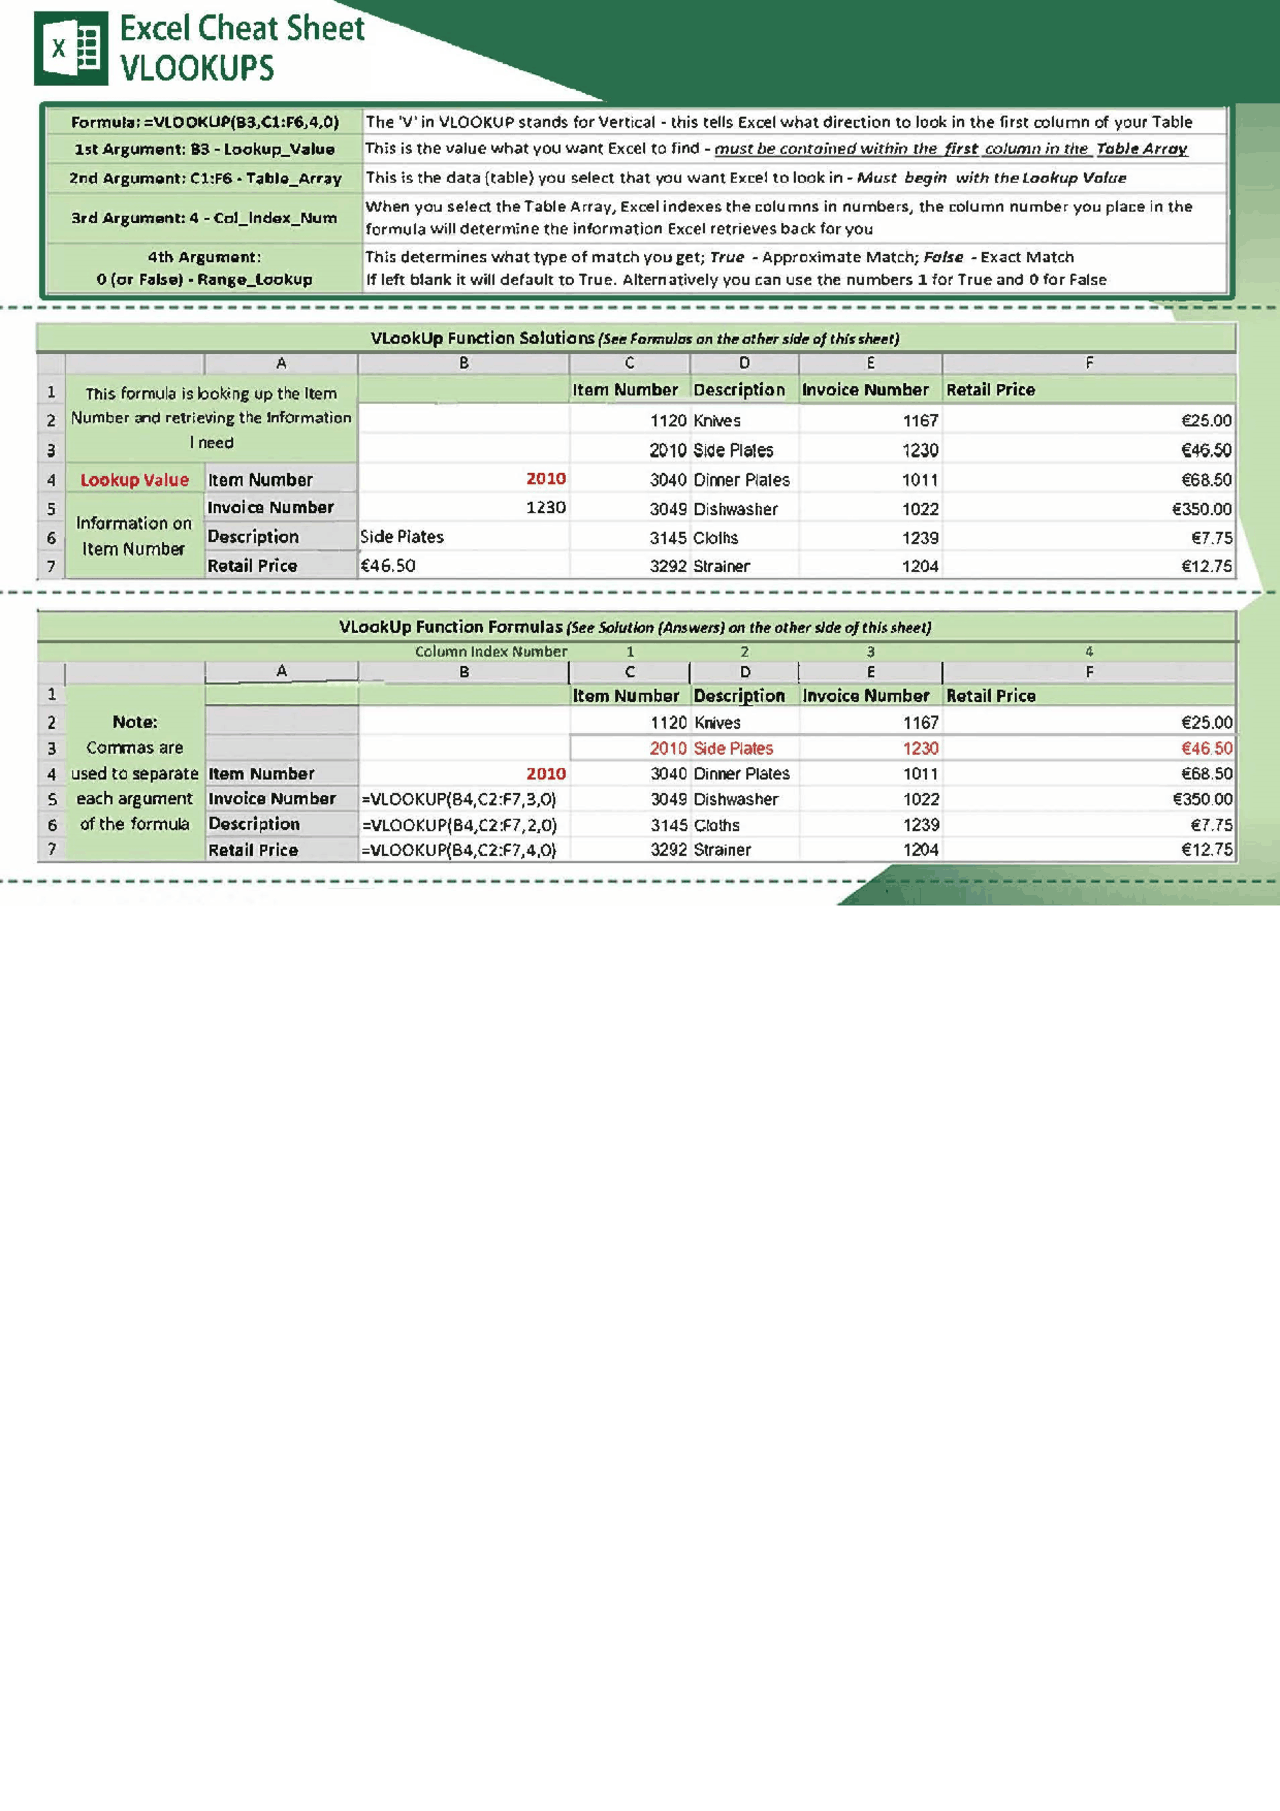 Excel Cheat Sheet VLookUp   Docsity